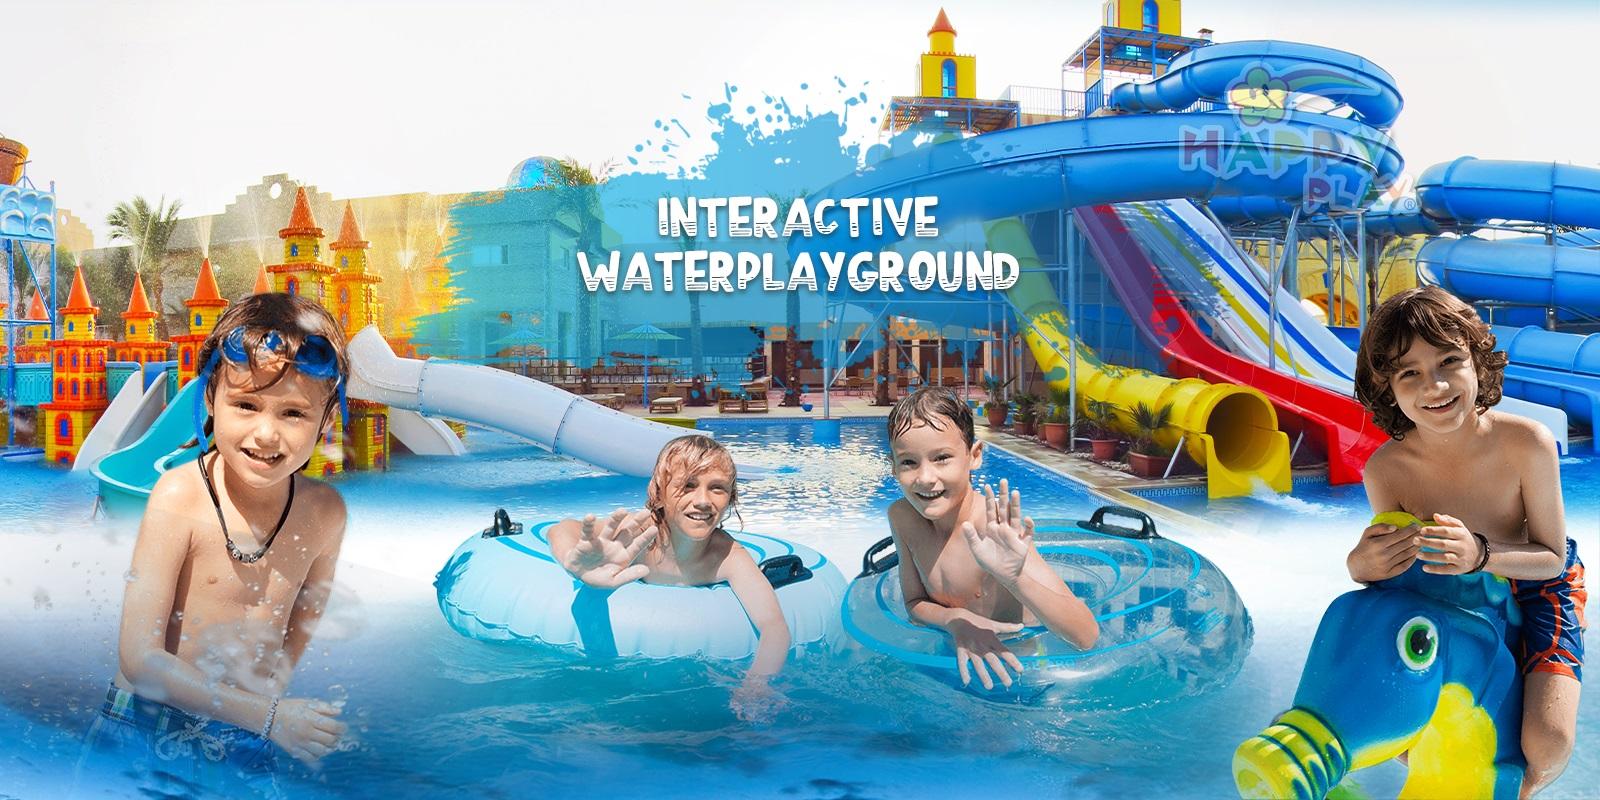 waterplayground outdoor